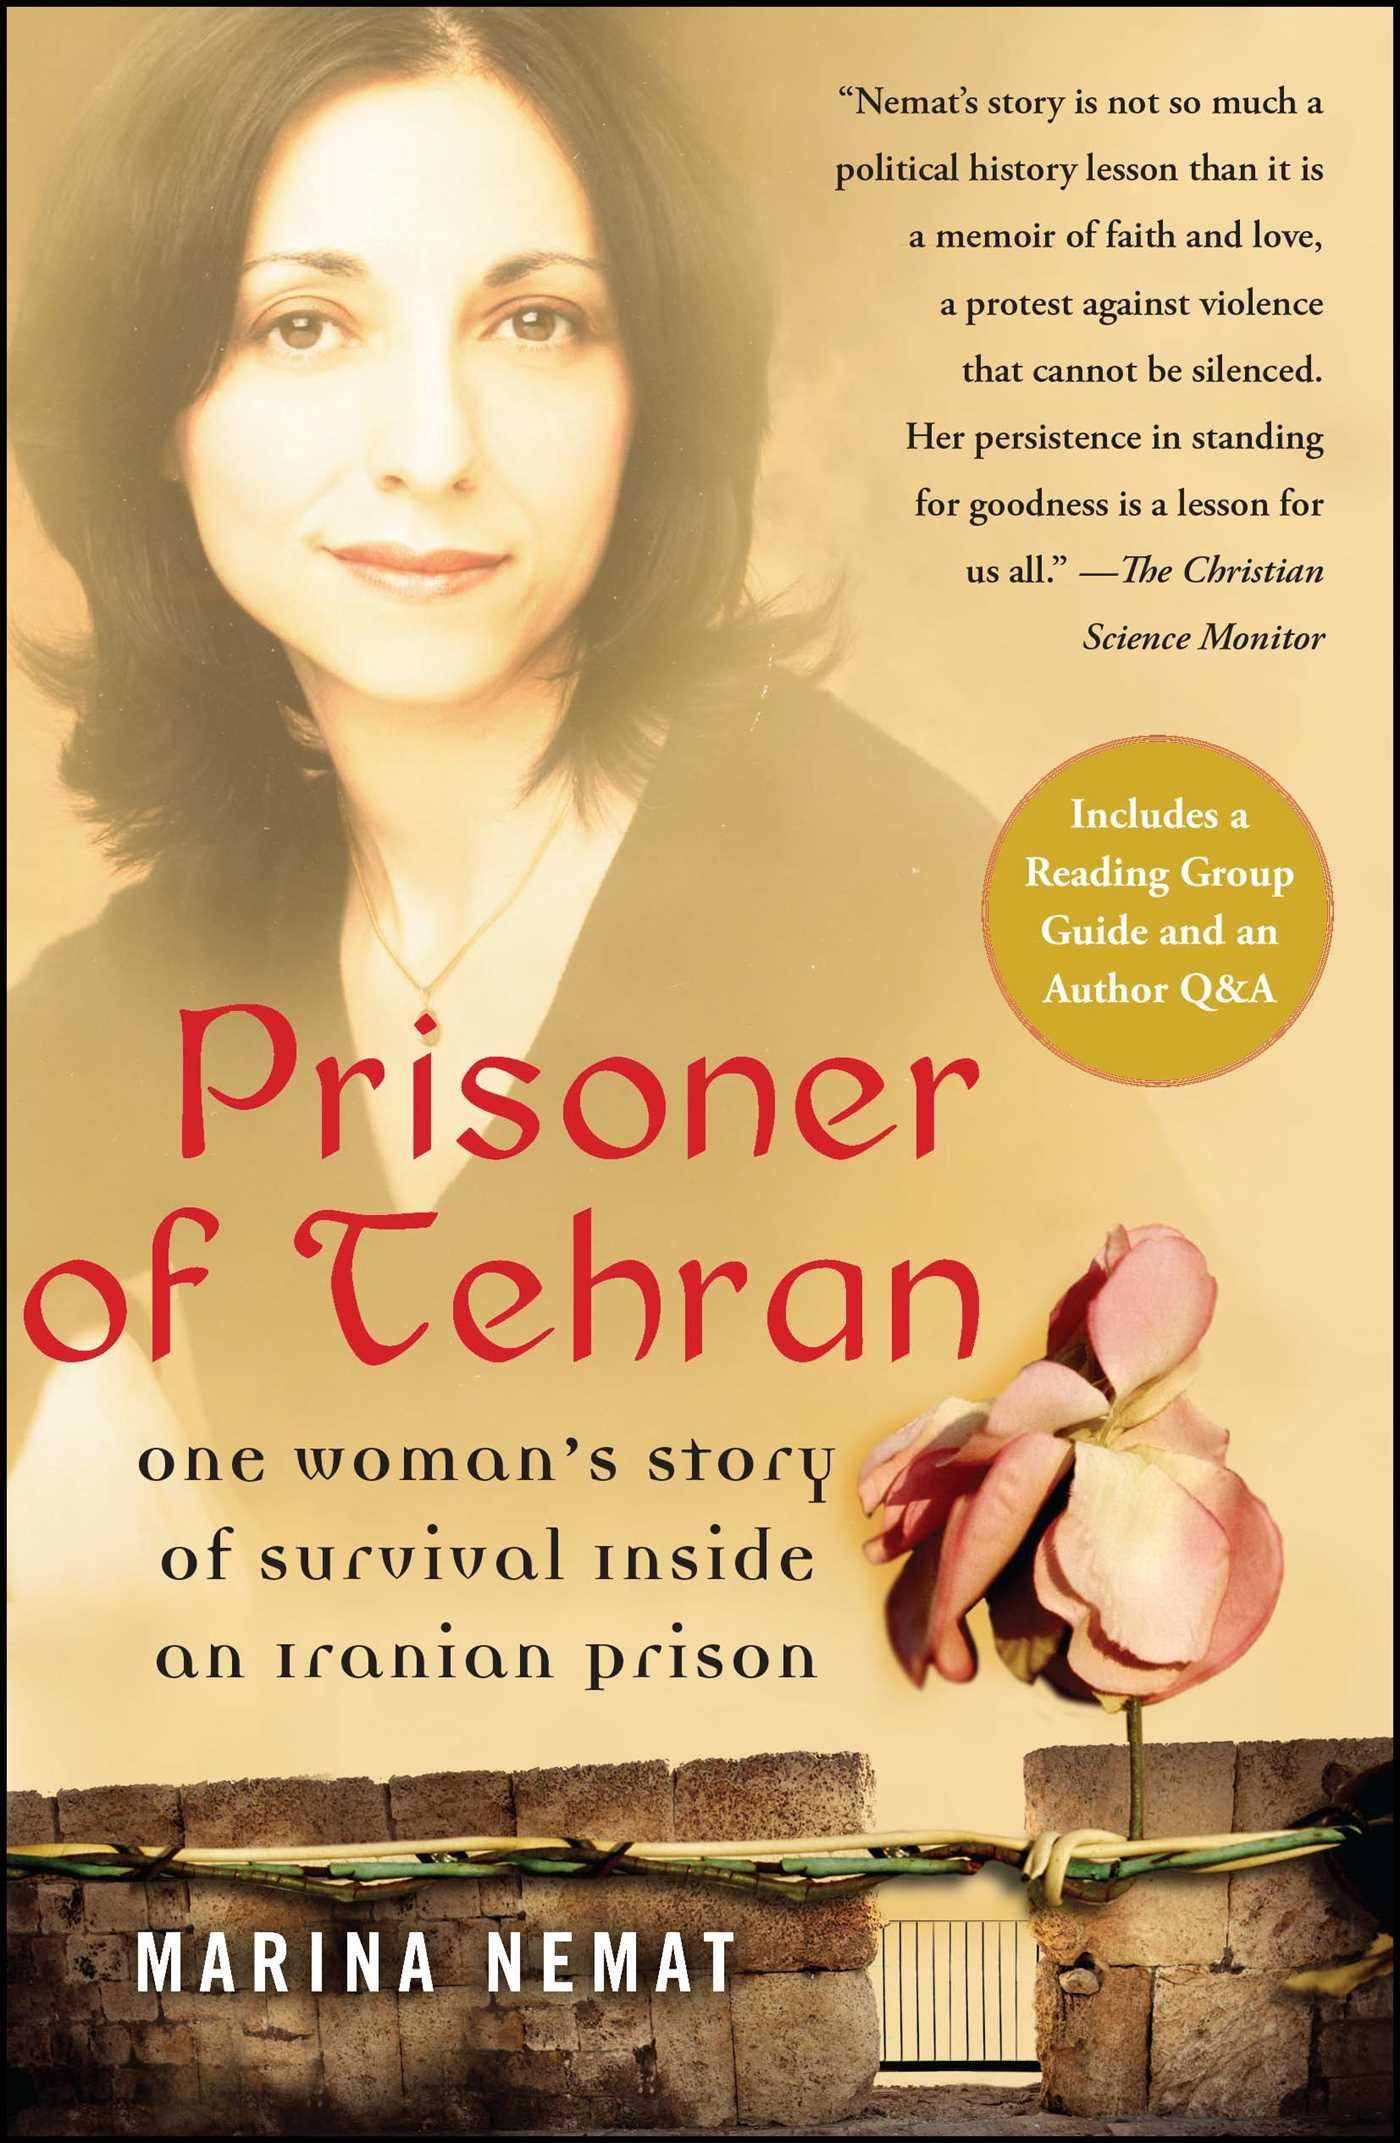 Prisoner of Tehran: One Woman's Story of Survival Inside an Iranian Prison:  M. Nemat: 9781416537434: Amazon.com: Books